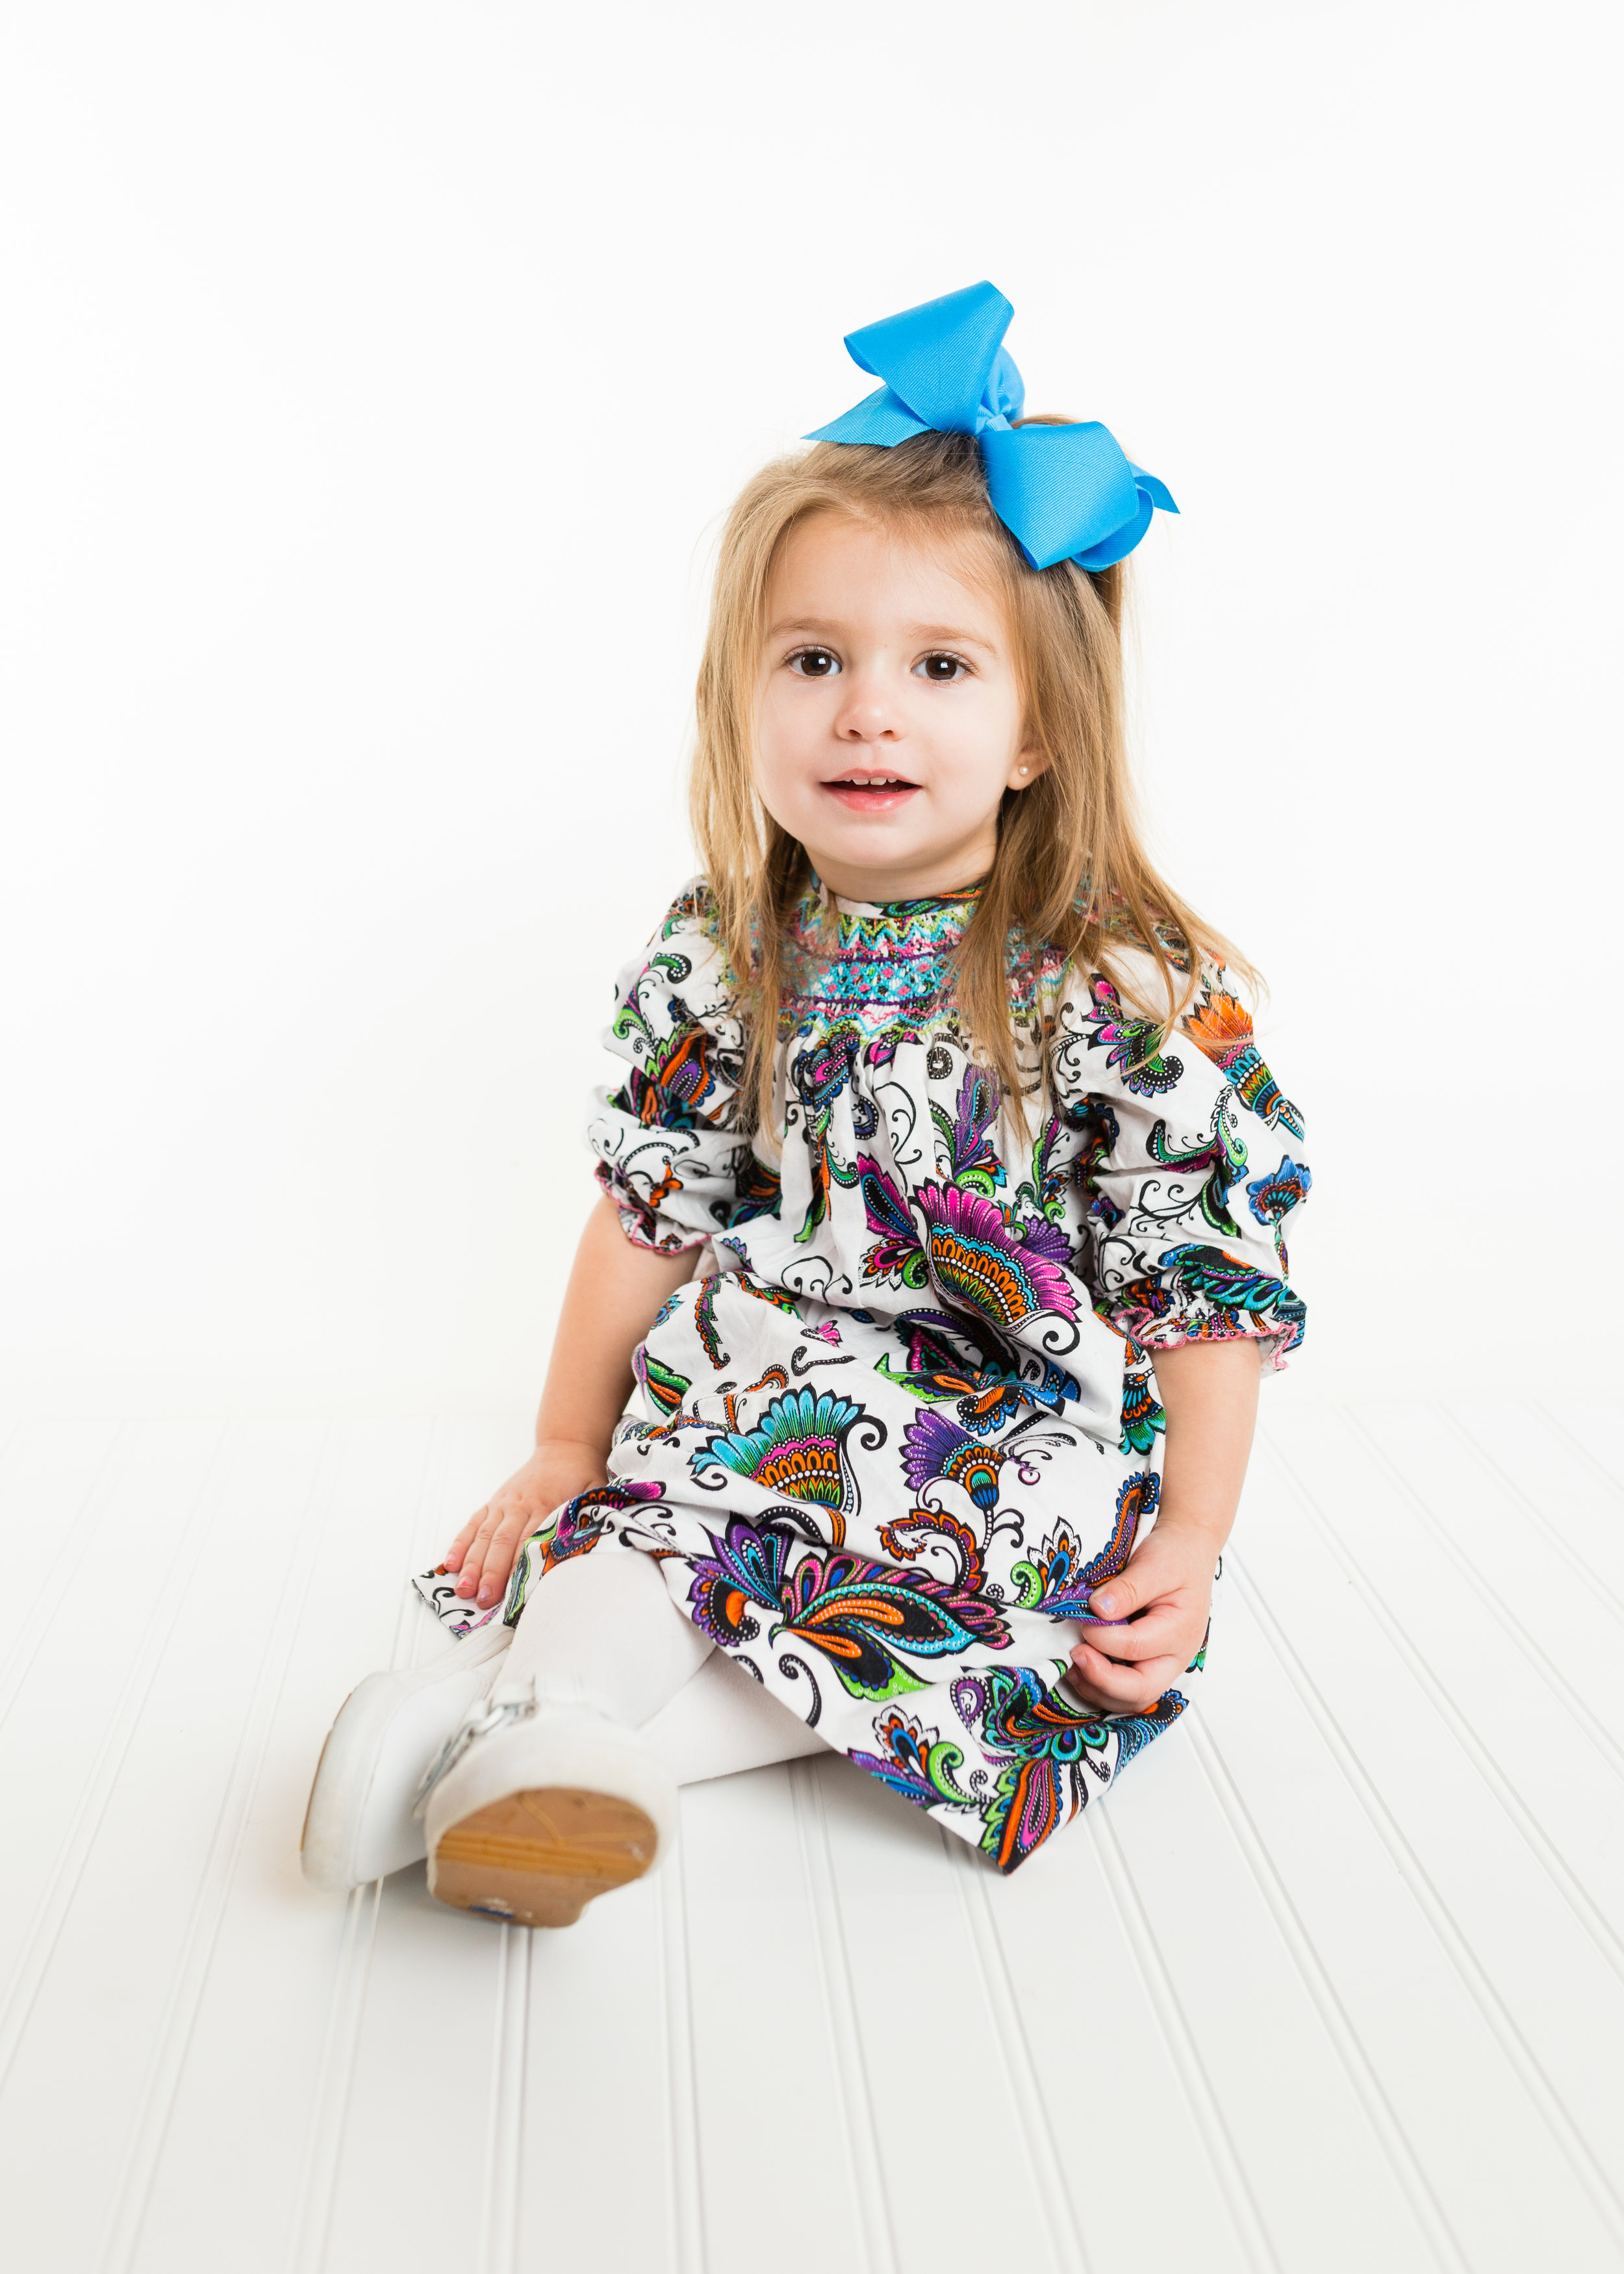 Family-child-portrait-lafayette-broussard-youngsville-photographer-1-5.jpg